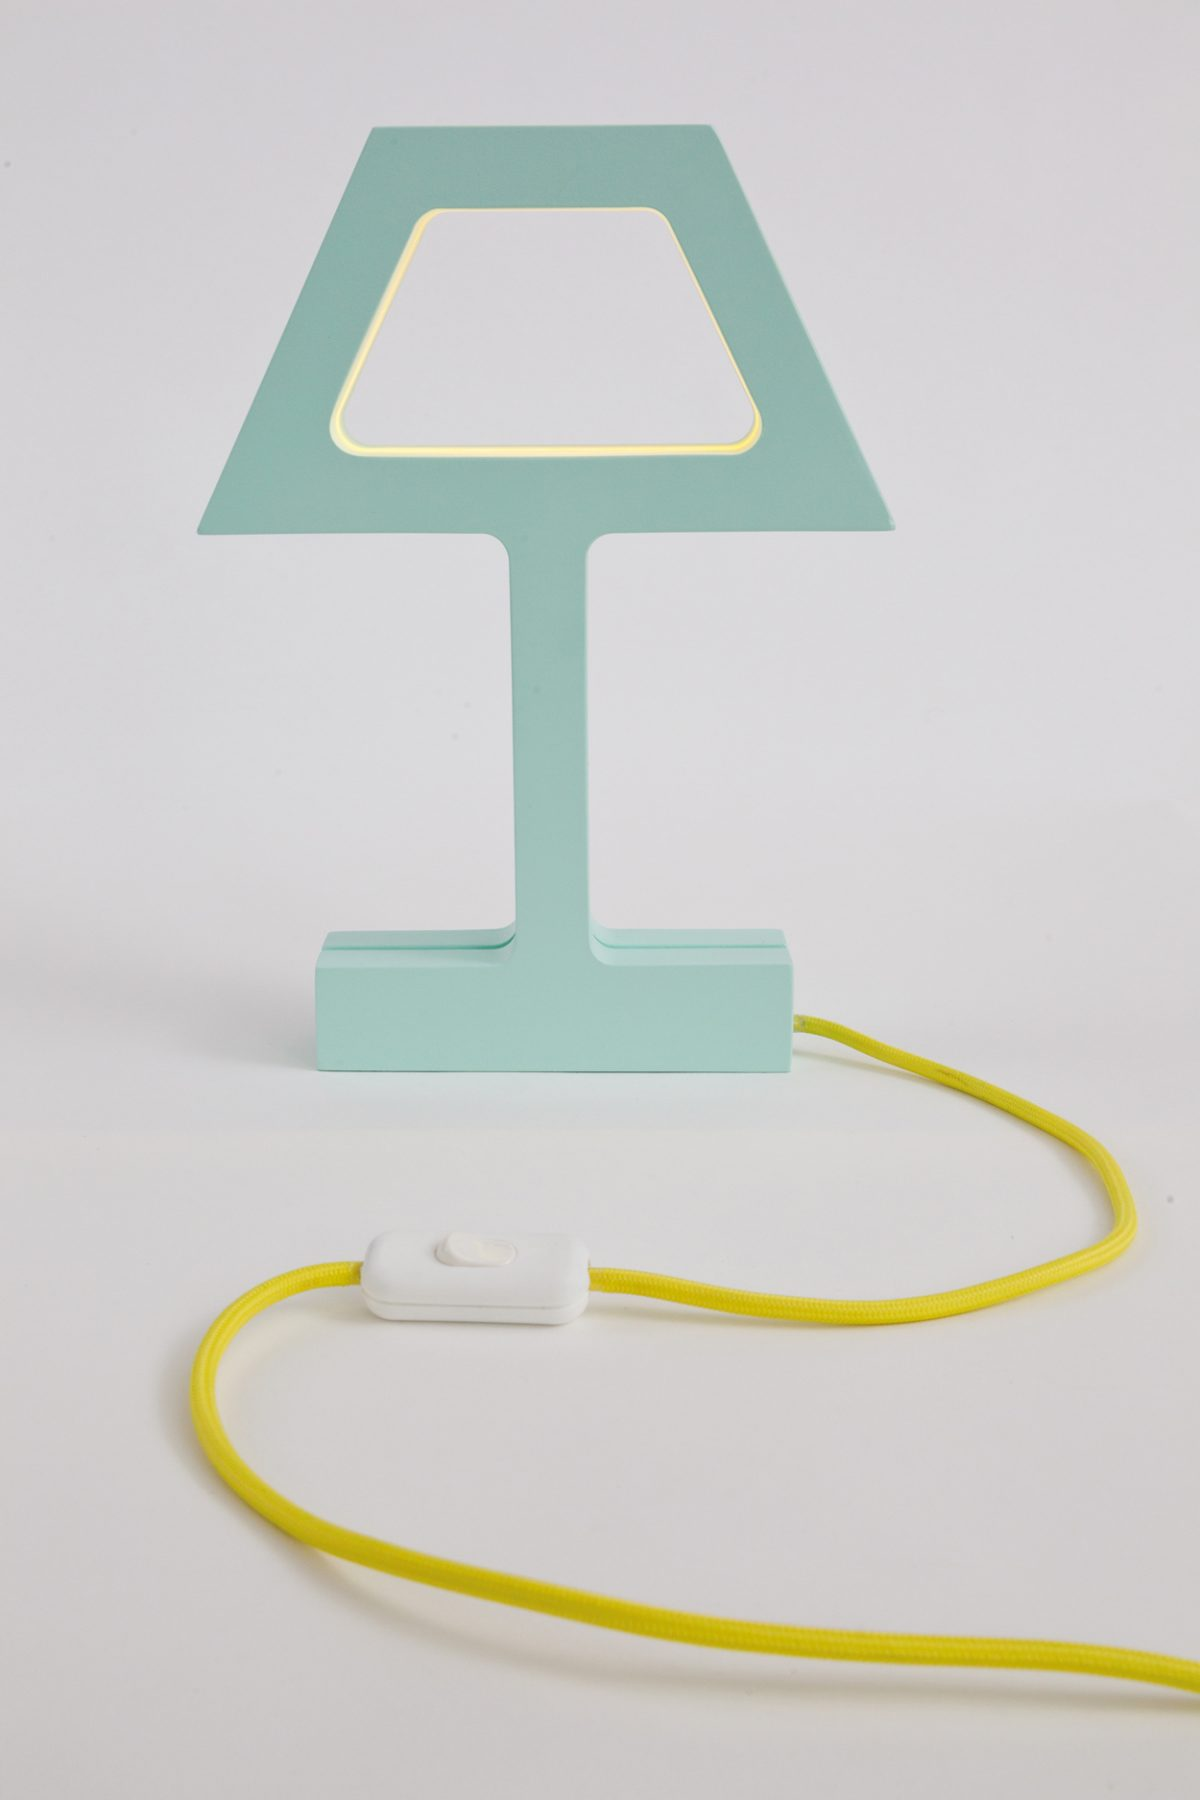 Tafellamp The Missing Bulb modern groen geel snoer – Jolanda van Goor